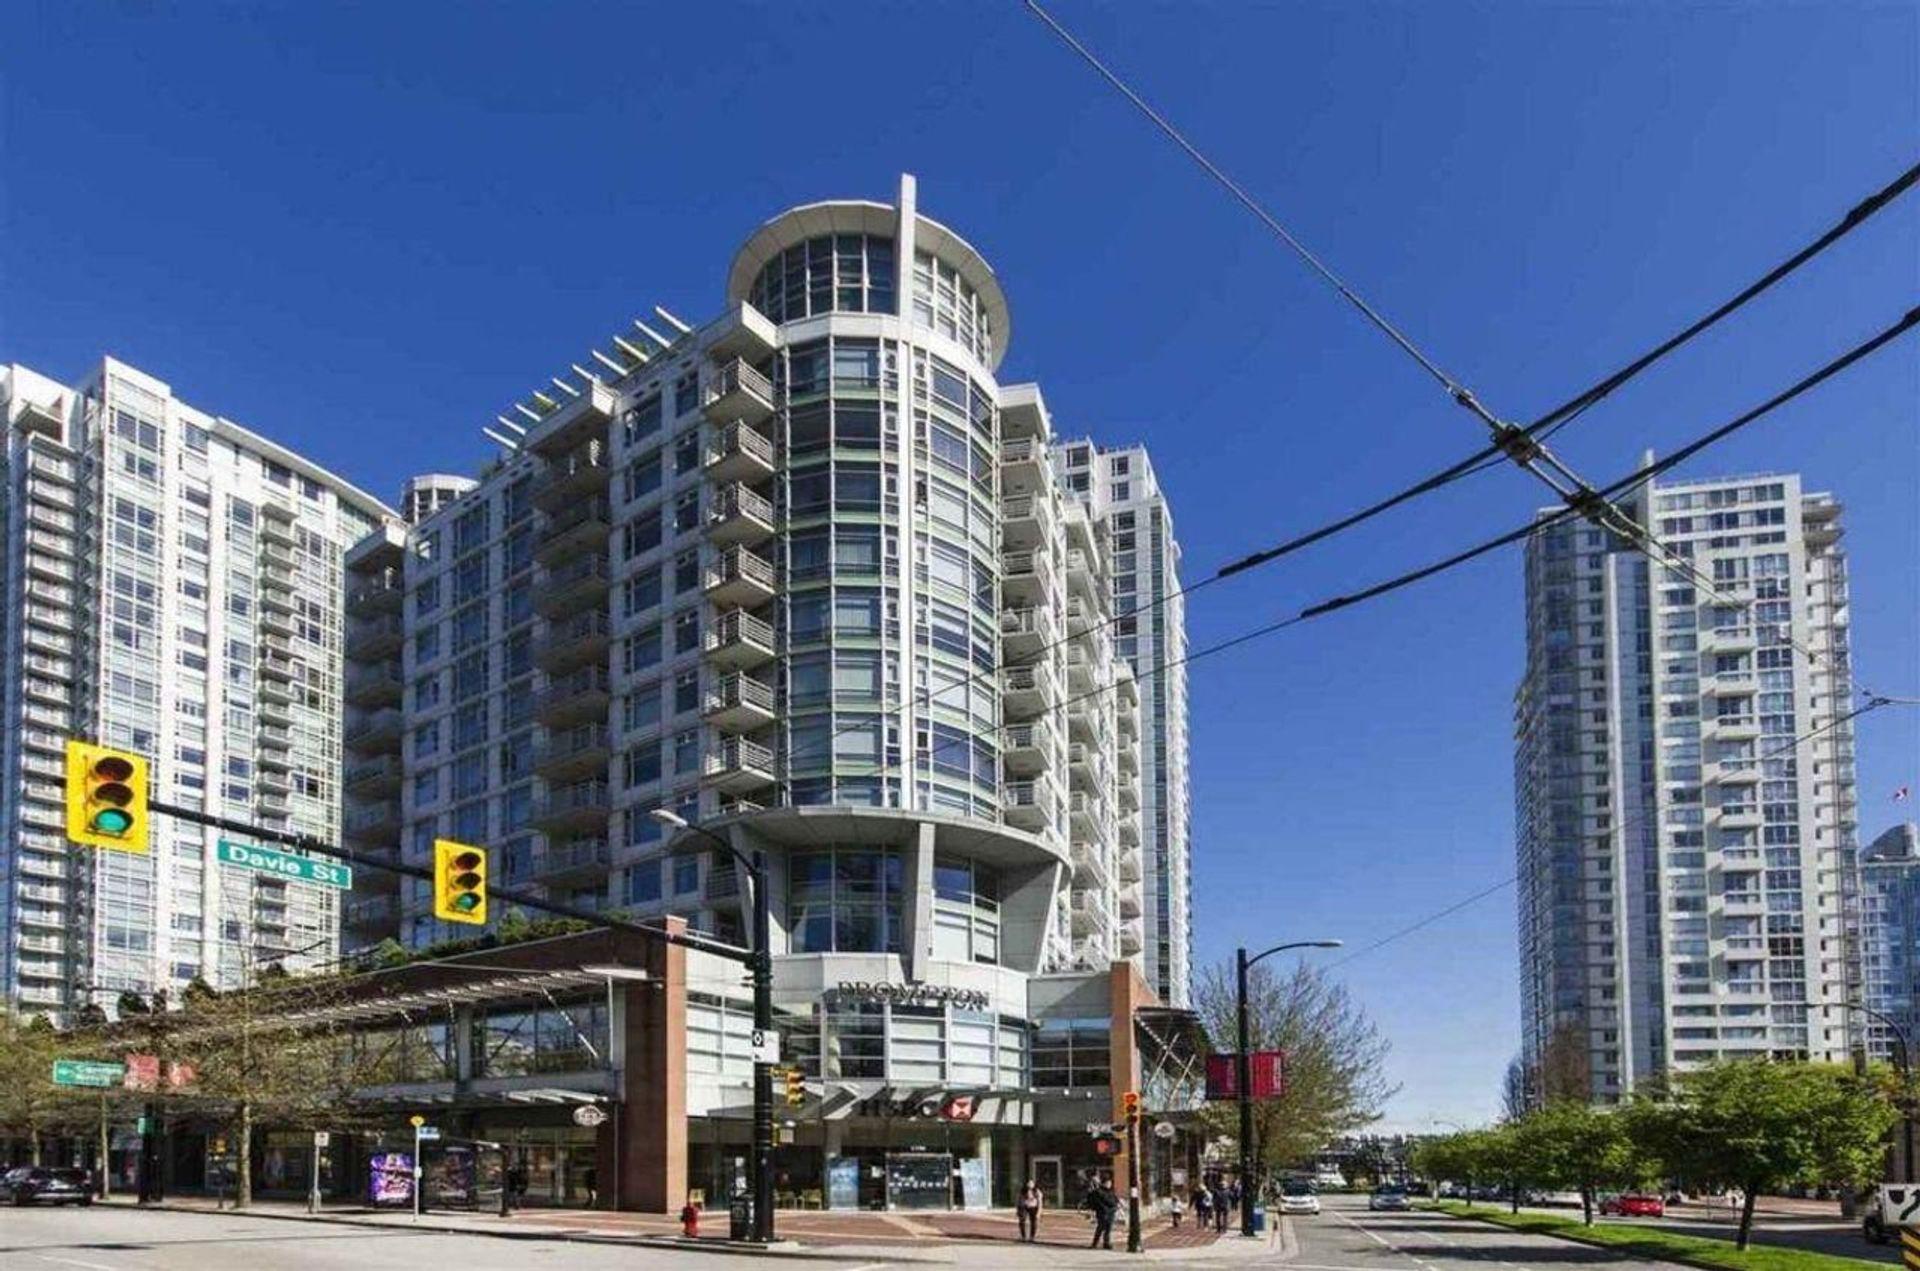 189-davie-street-yaletown-vancouver-west-01 at 1601 - 189 Davie Street, Yaletown, Vancouver West